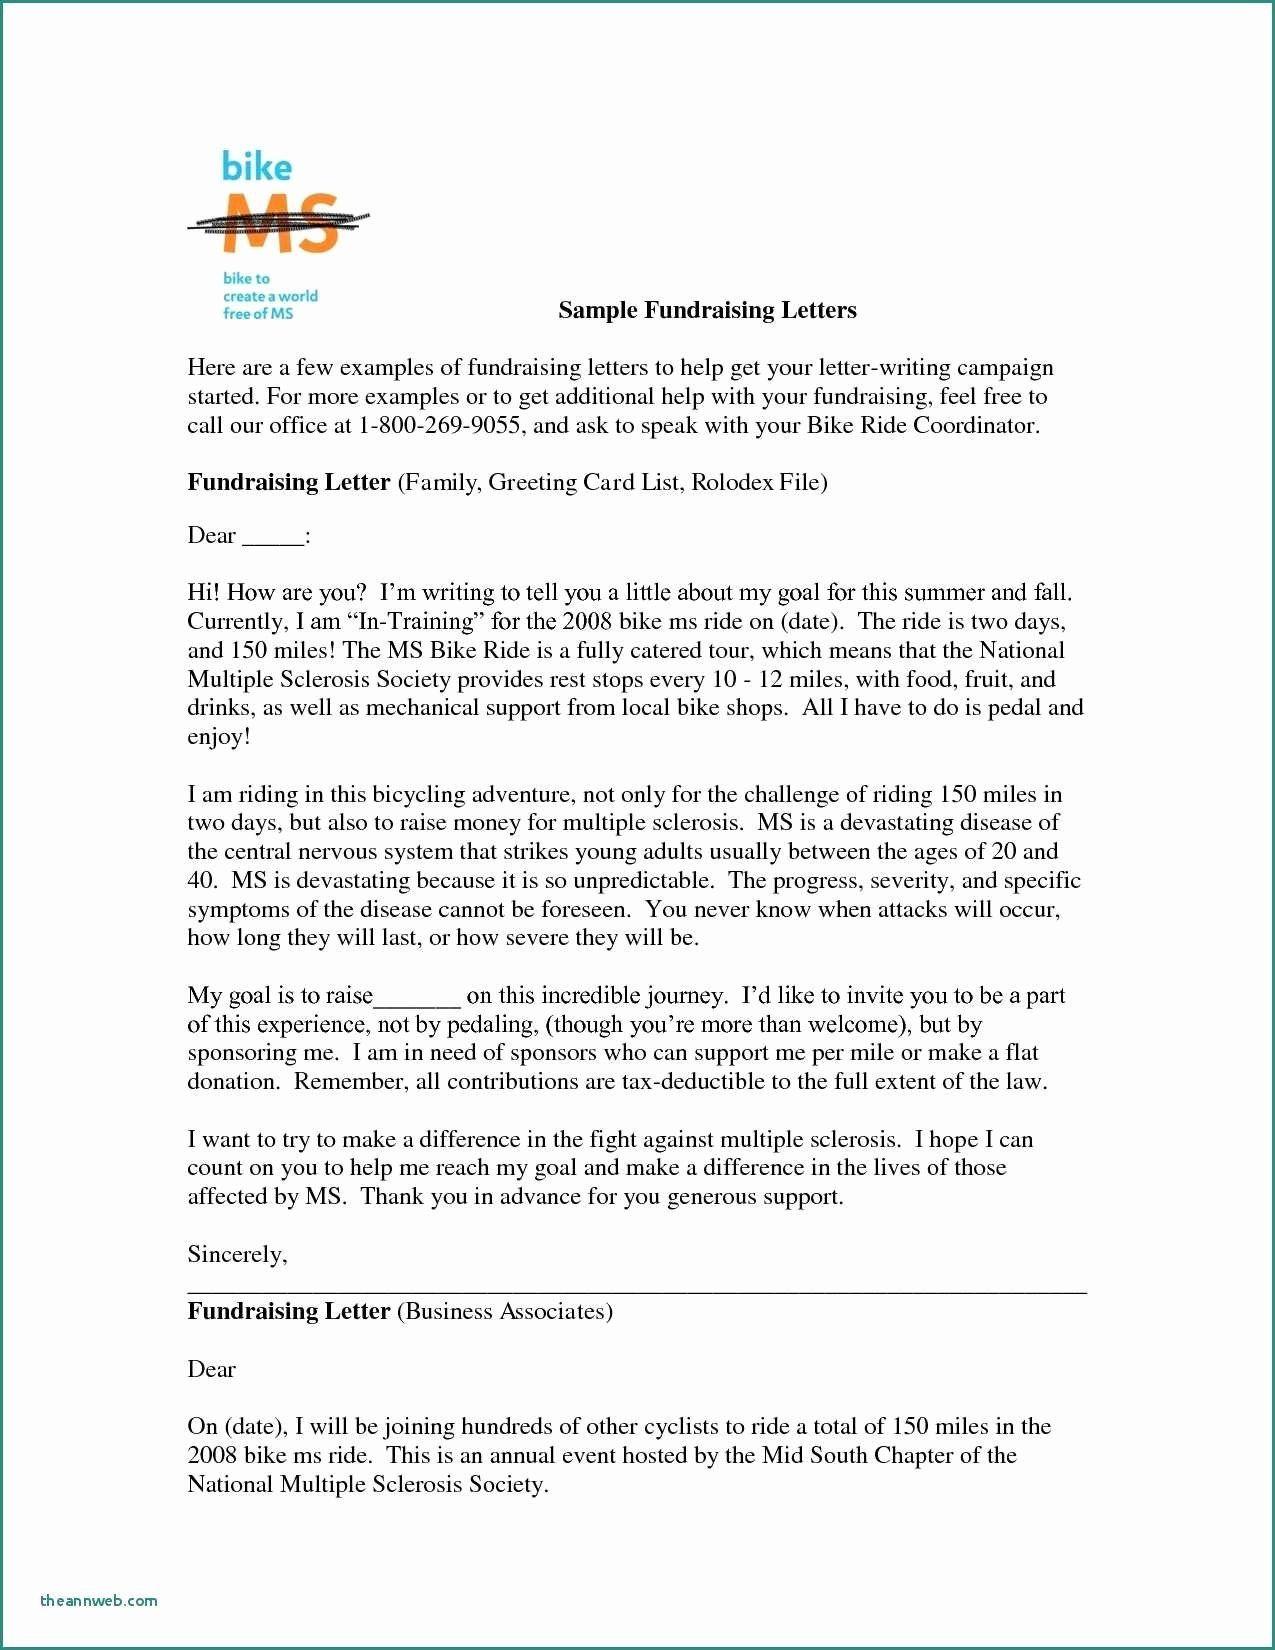 Samples Of Graduation Invitation Inspirational Wedding Invitation Card Template Sample Fundraising Letters Fundraising Letter Letter Templates